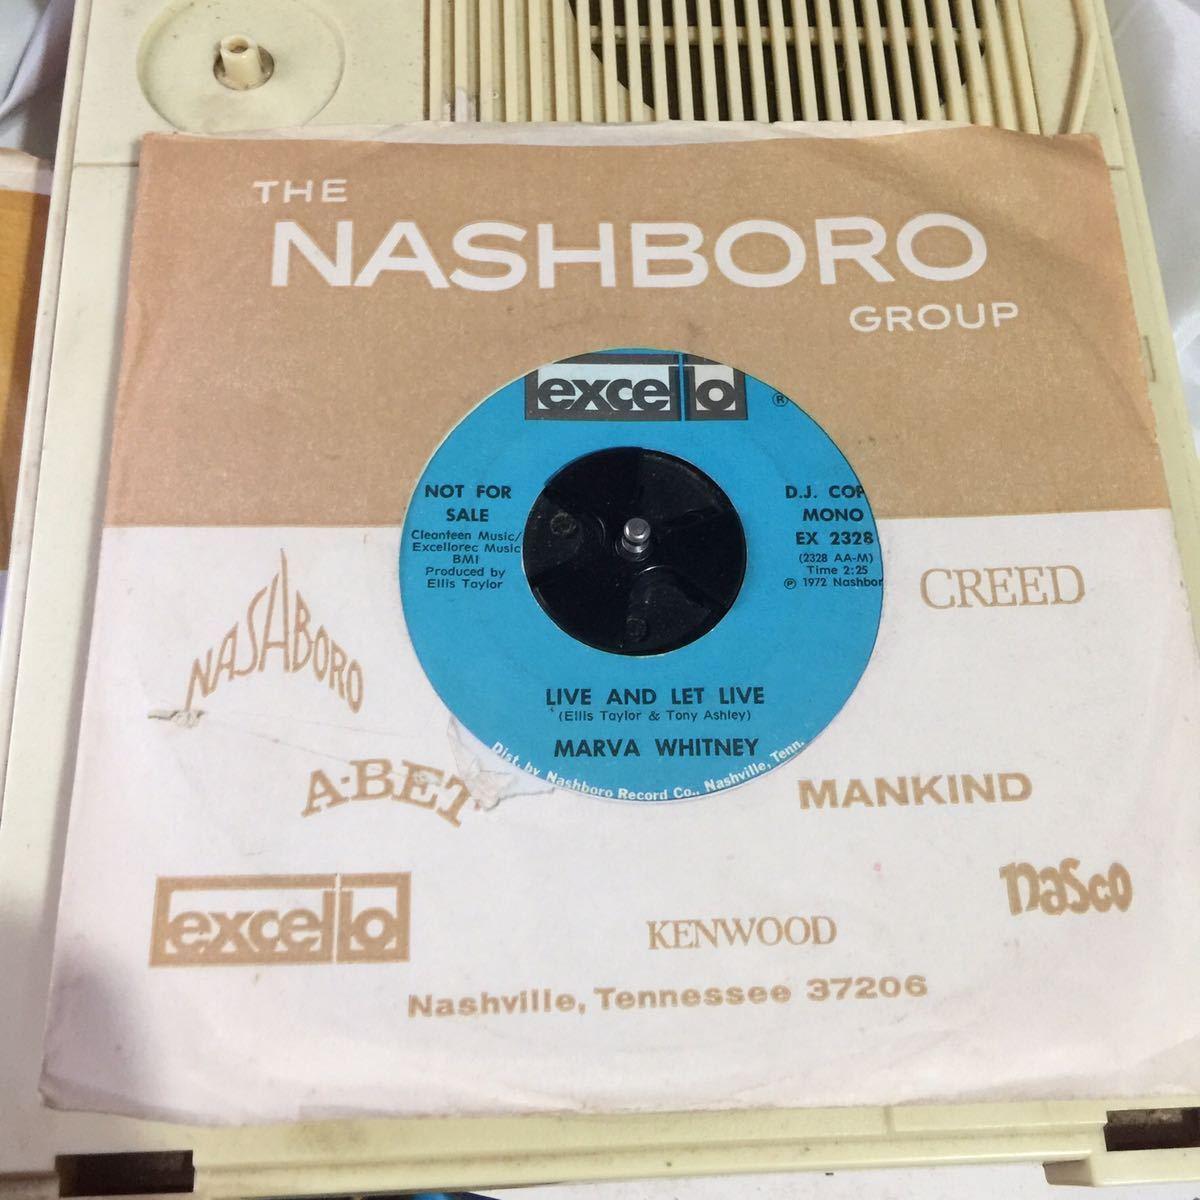 ames Brown一派の人気歌姫 Marva Whitney が Excelloレーベルから72年にリリースしたシングルオンリー盤 でプロモ盤 let and let live